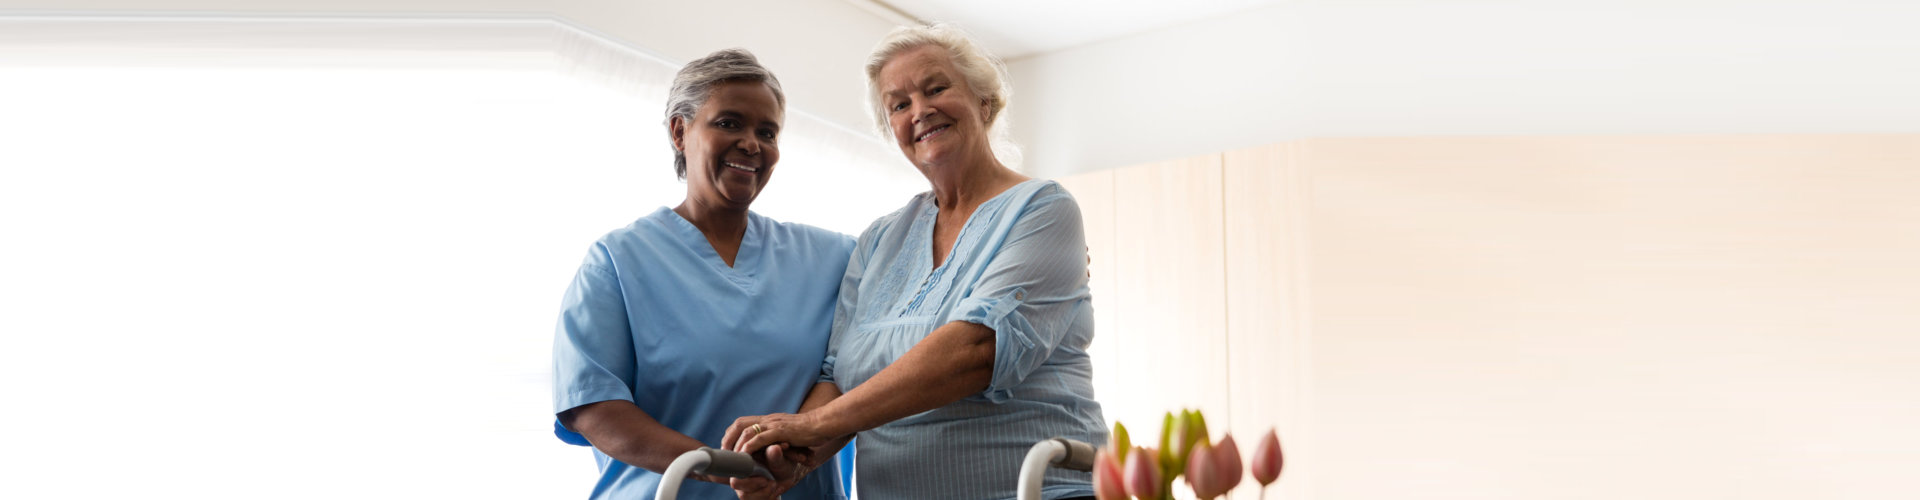 caregiver and senior woman smiling at the camera